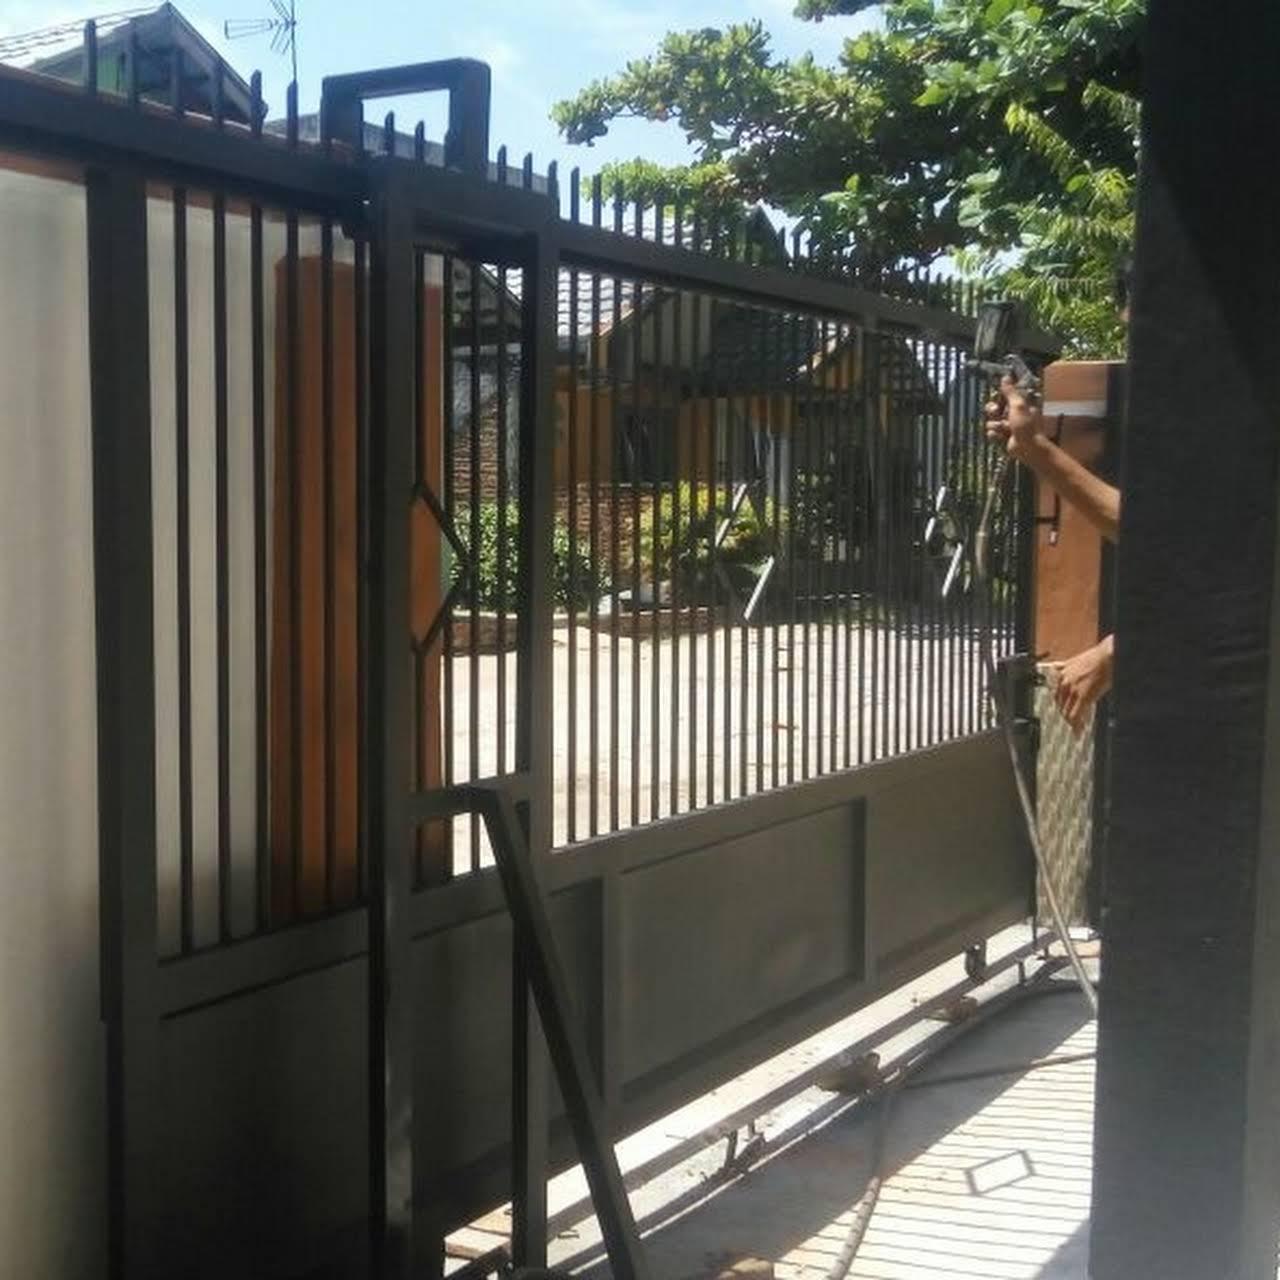 Bengkel Las Semangat Menikah (MITRA LOGAM) - Metal Working Shop